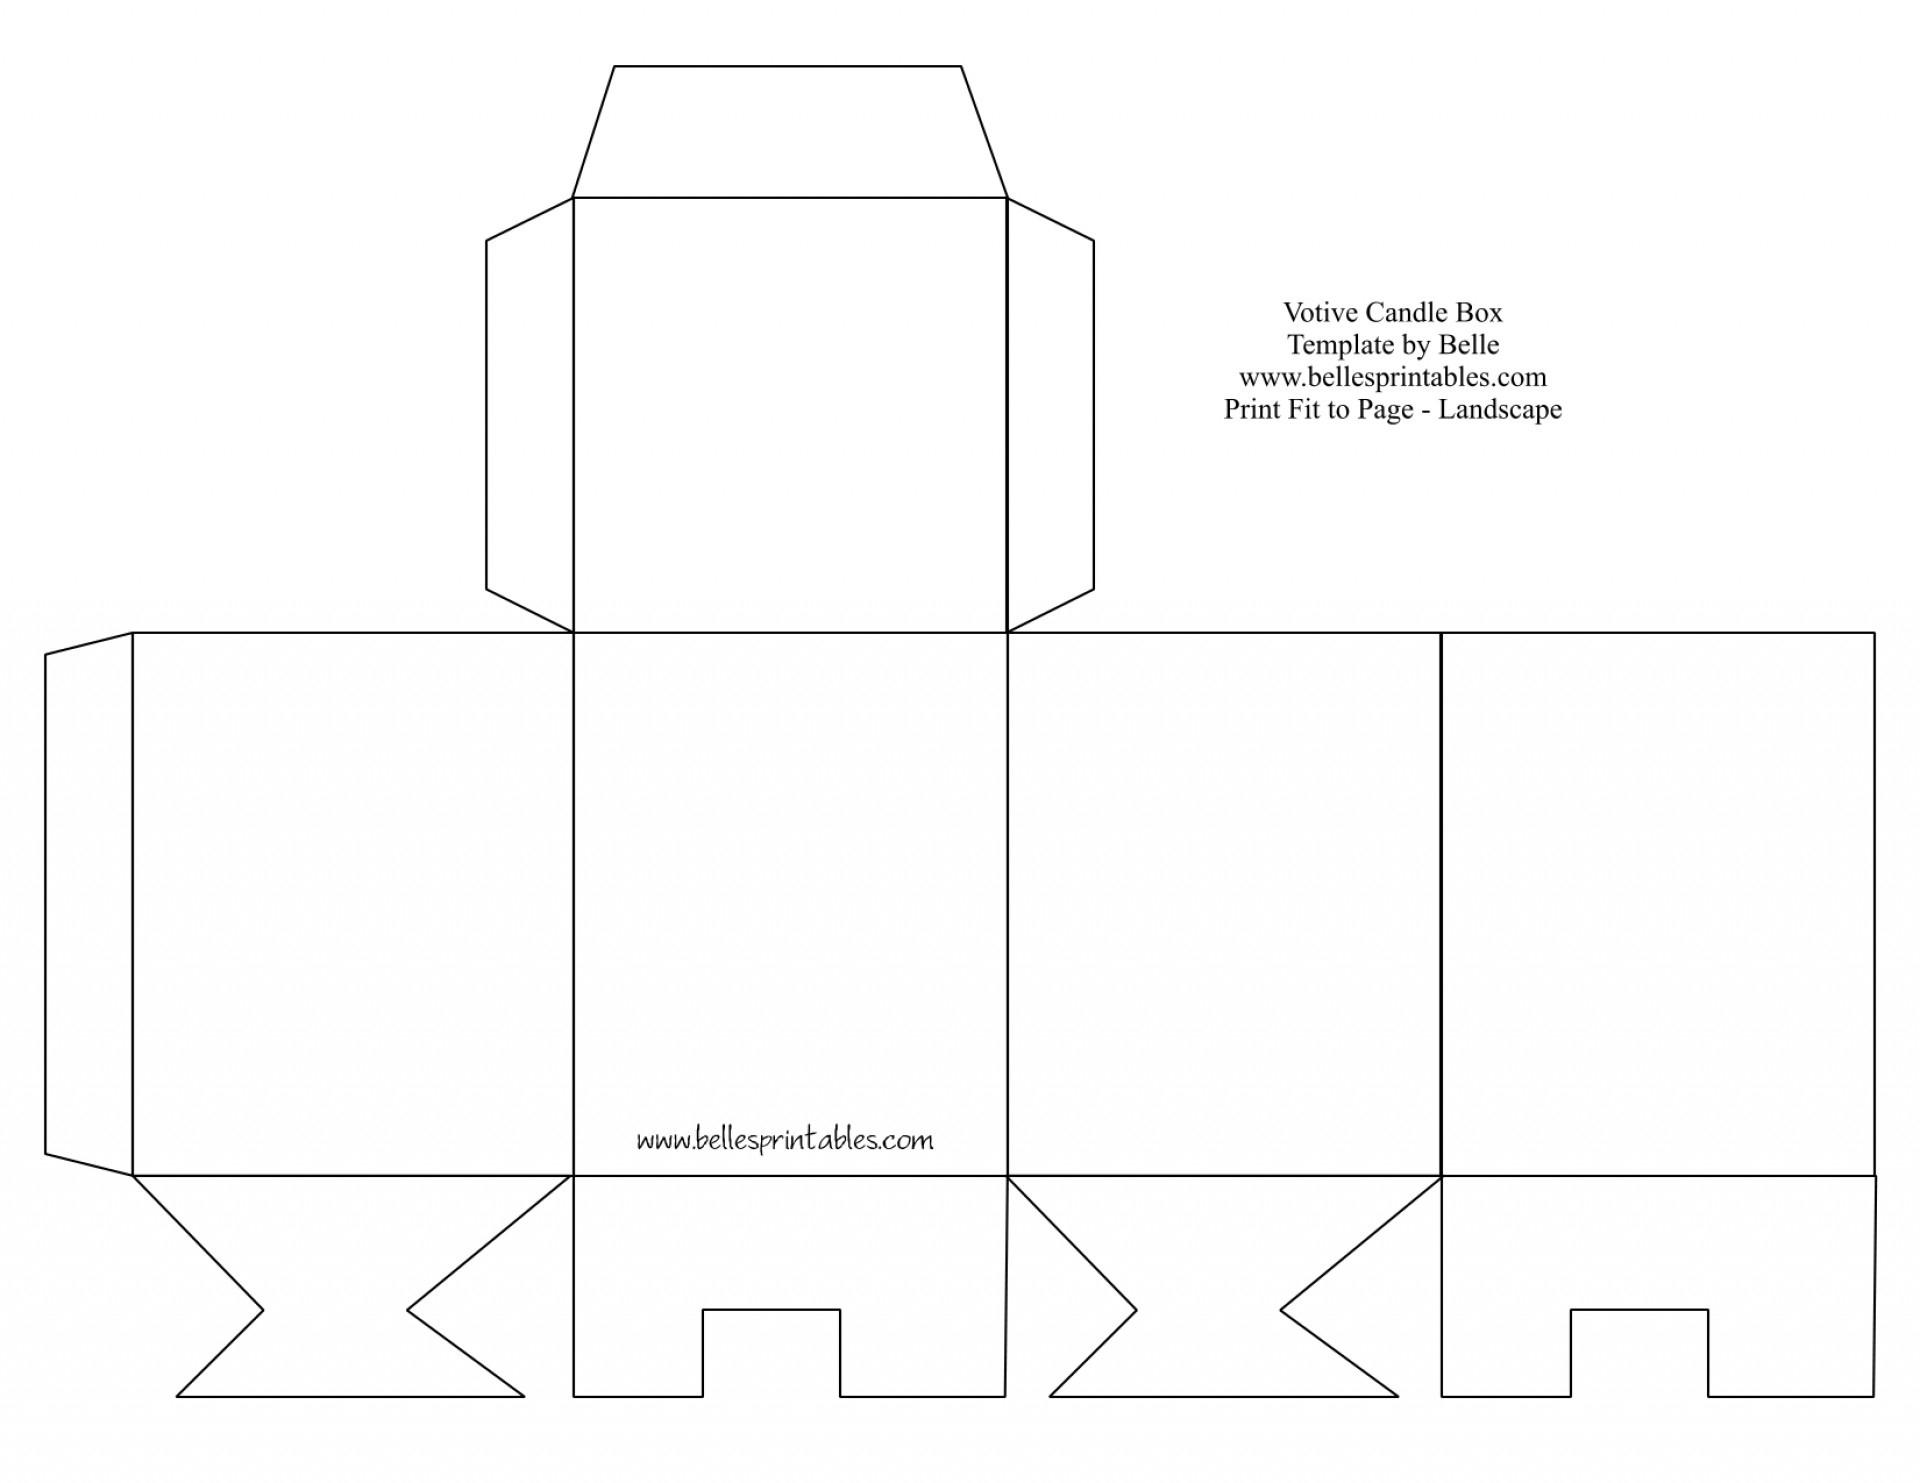 008 Box Templates Free Printable Template Ideas 13990 Unbelievable - Box Templates Free Printable